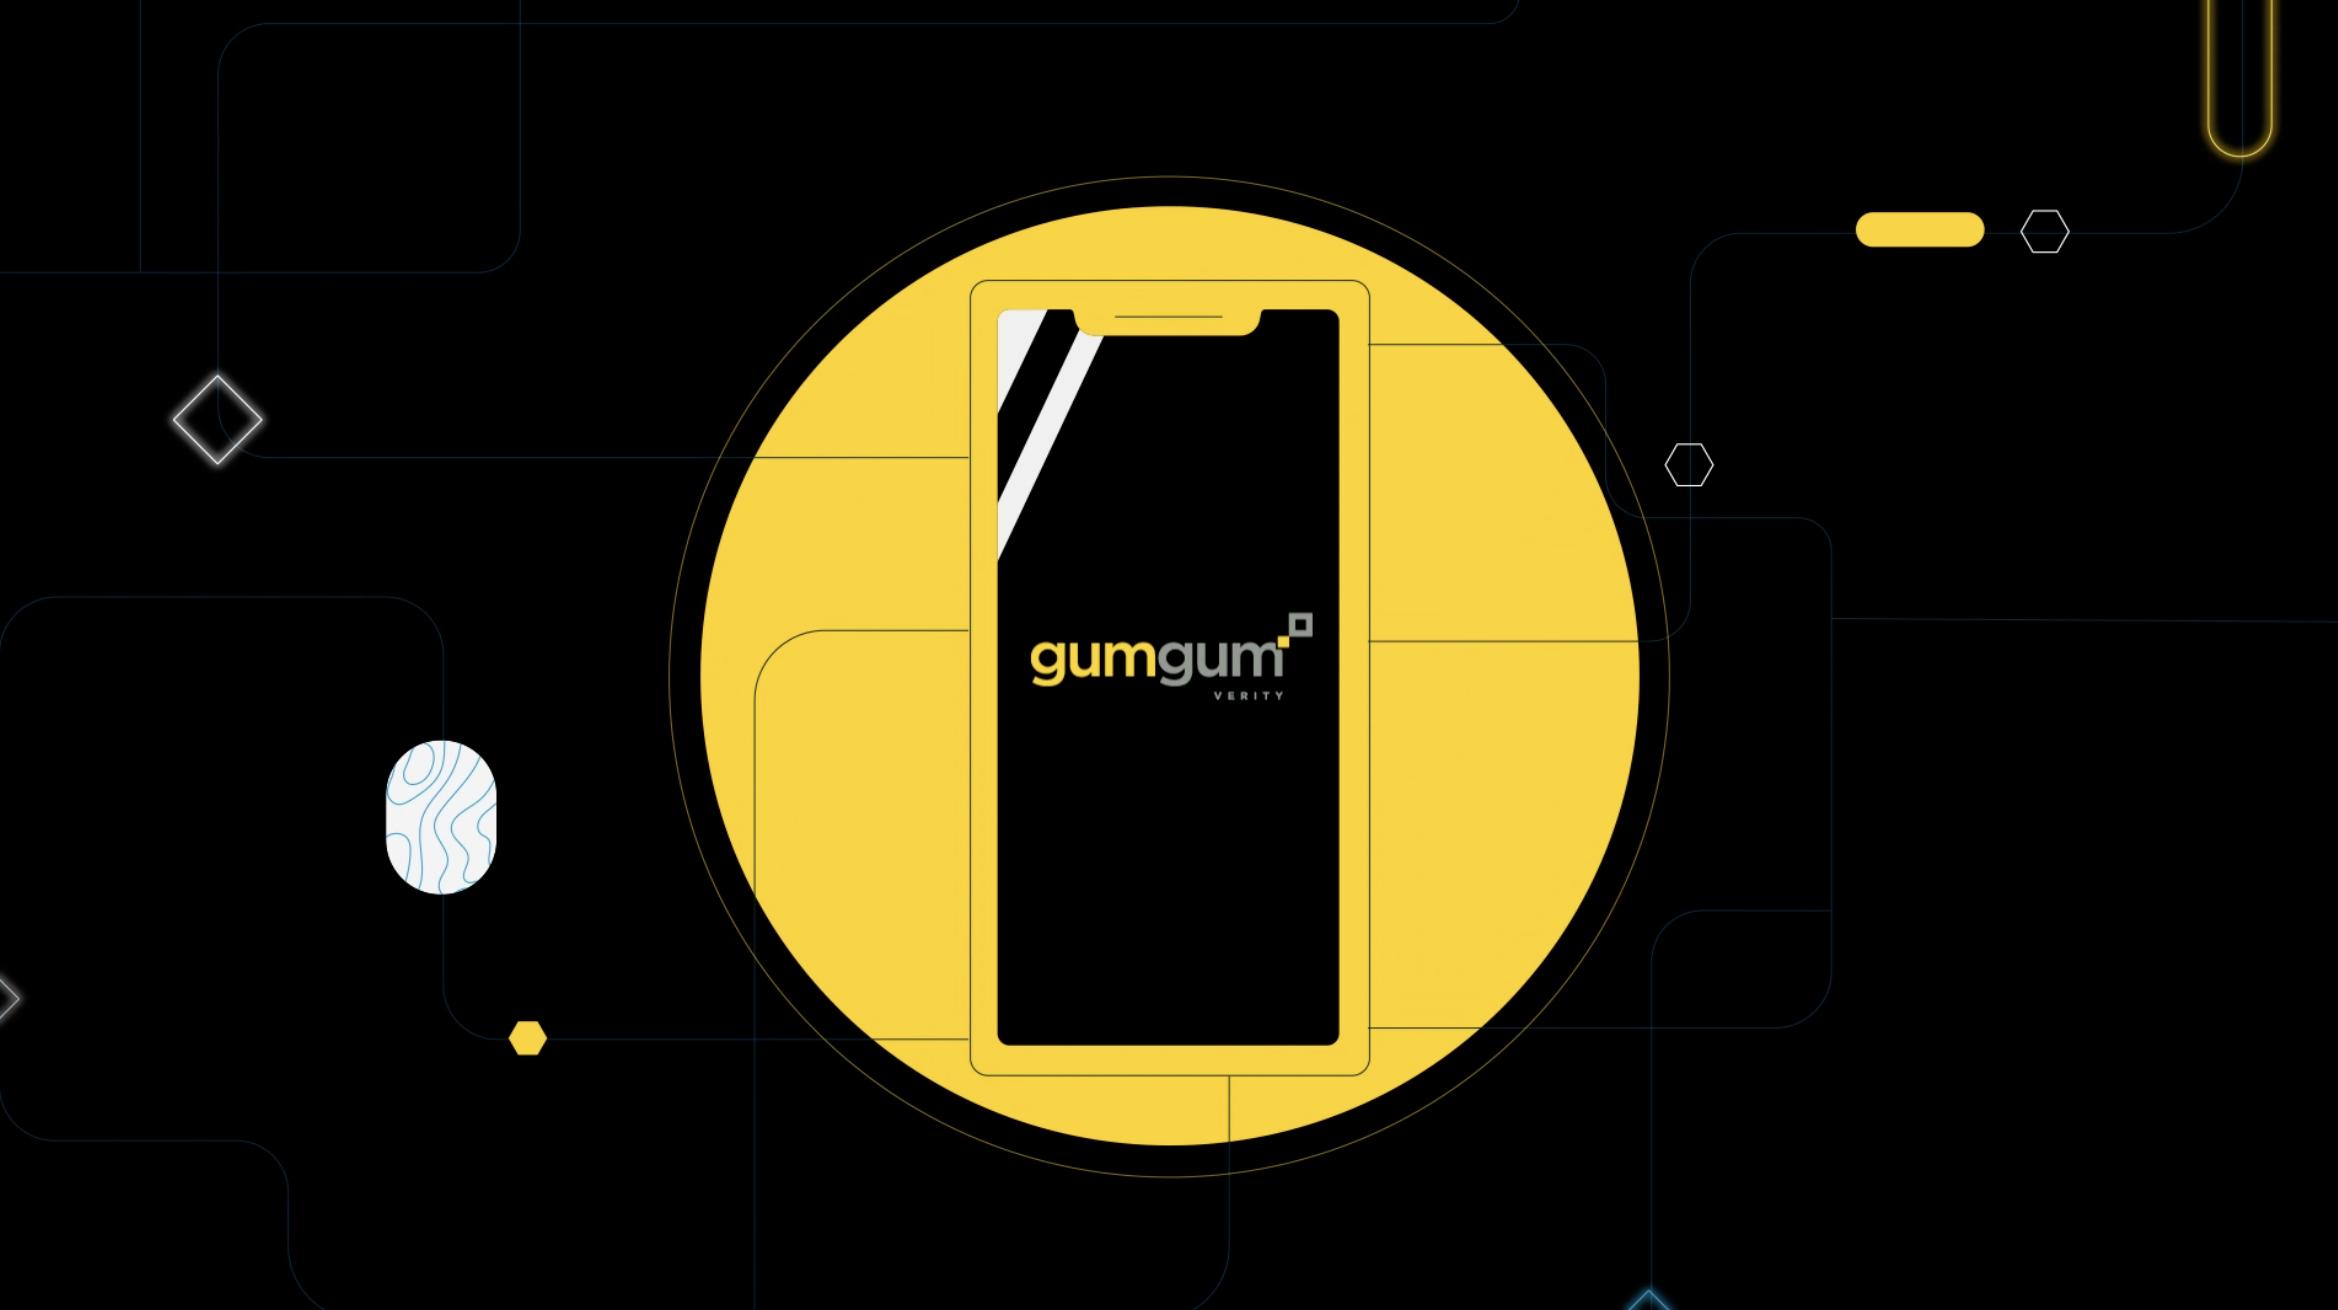 Case Study, AI-based brand safety, gumgum tool Verity, explainer video, gumgum